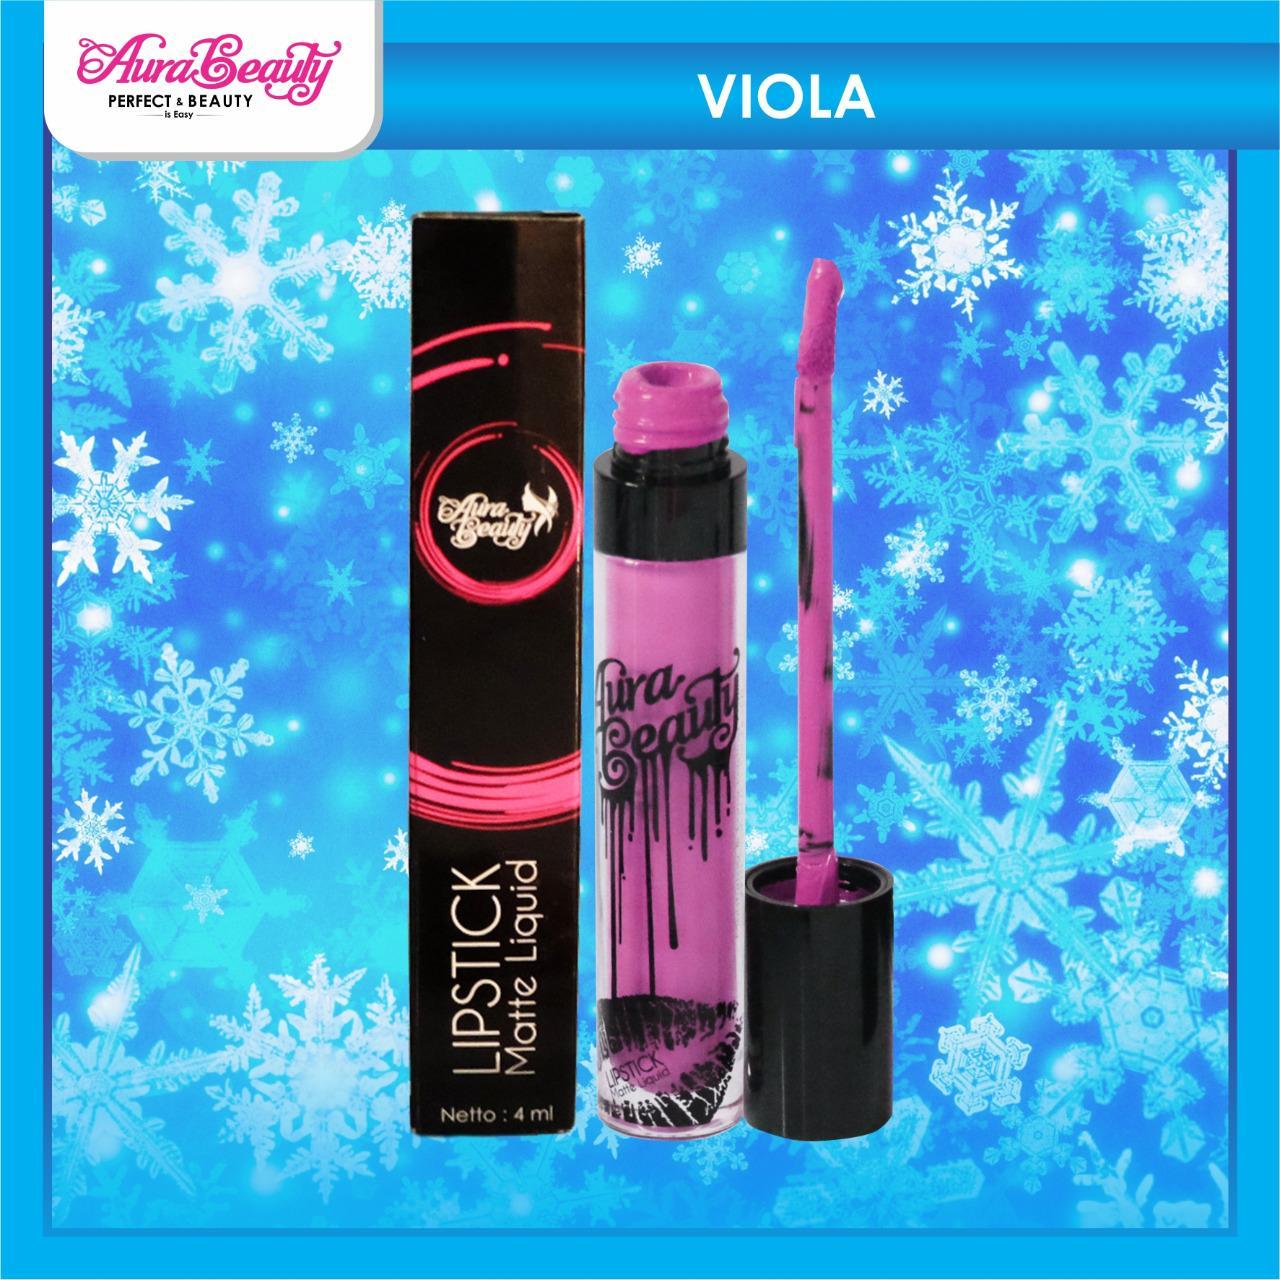 STOK TERBATAS!!! AURA BEAUTY LIPMATTE Viola Tekstur Creamy Liquid Waterproof Tahan Lama GARANSI BPOM Tekstur Lembut  Ringan Dibibir - Liptint - Lipstick - Colour Matte - Limited Edition - Make up - Make Up Bibir